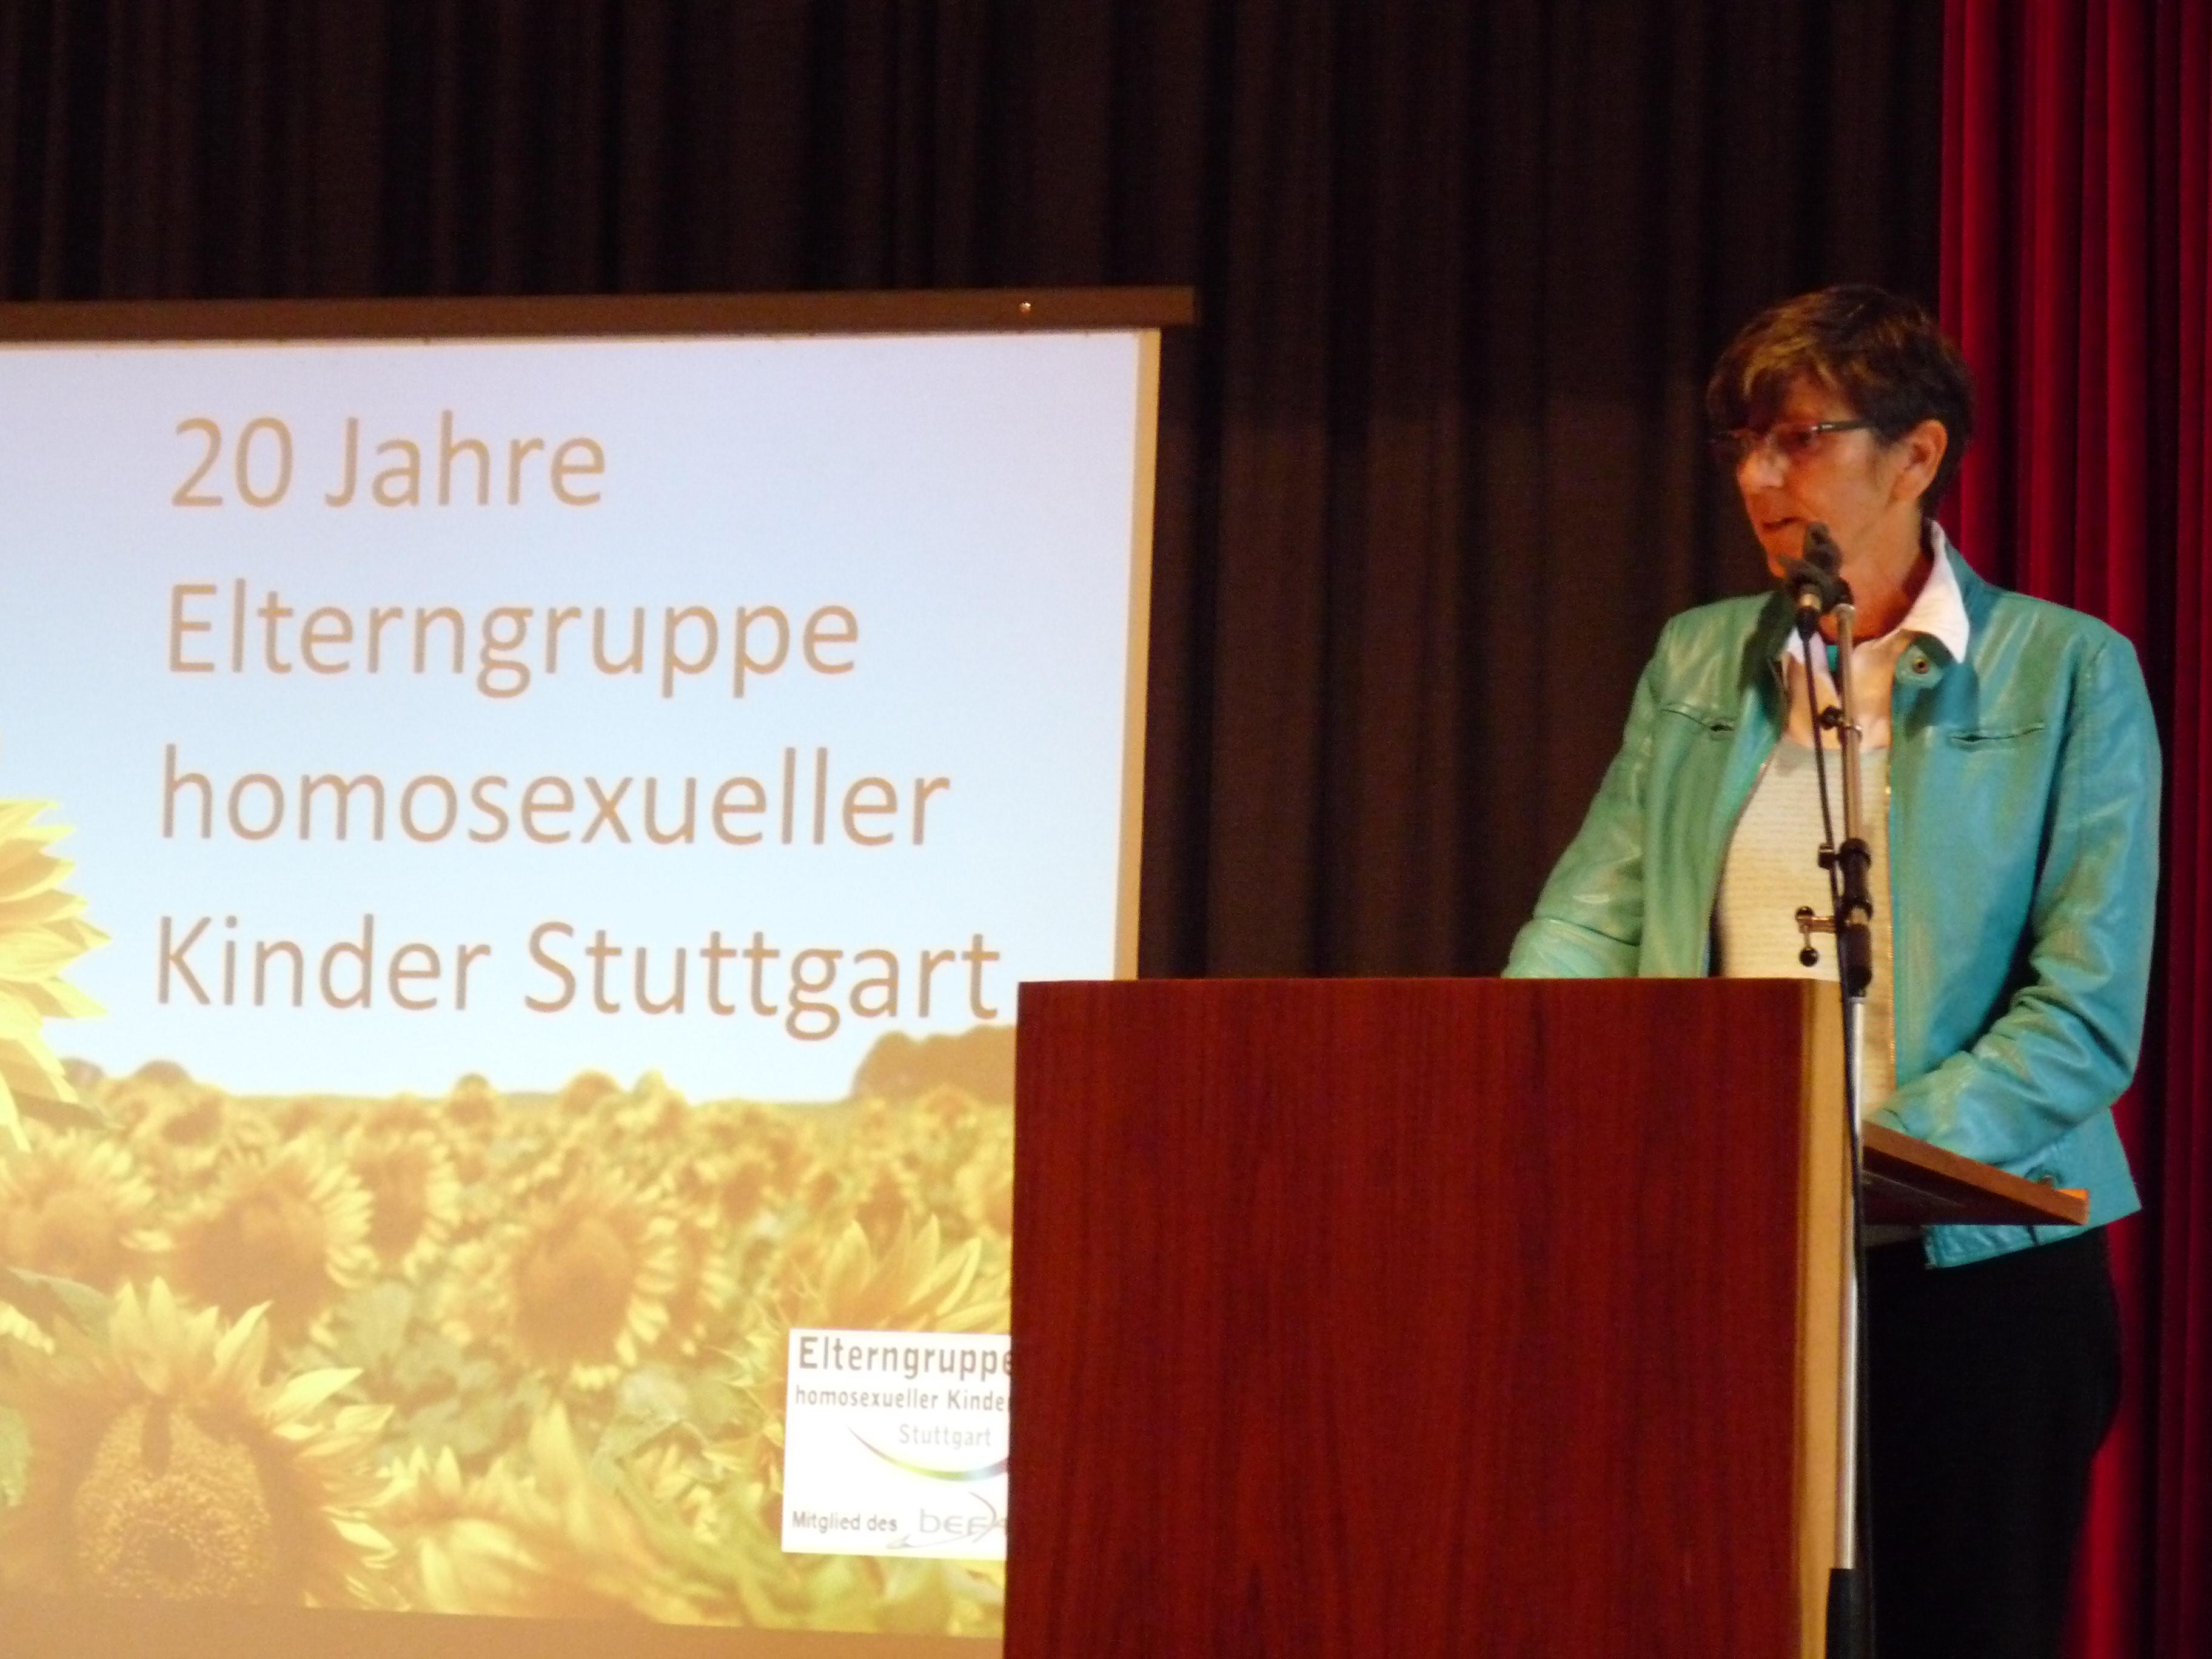 2013-Jubiläum-3-Prof.Dr.Monika Barz Netzwerk LSBTTIQ